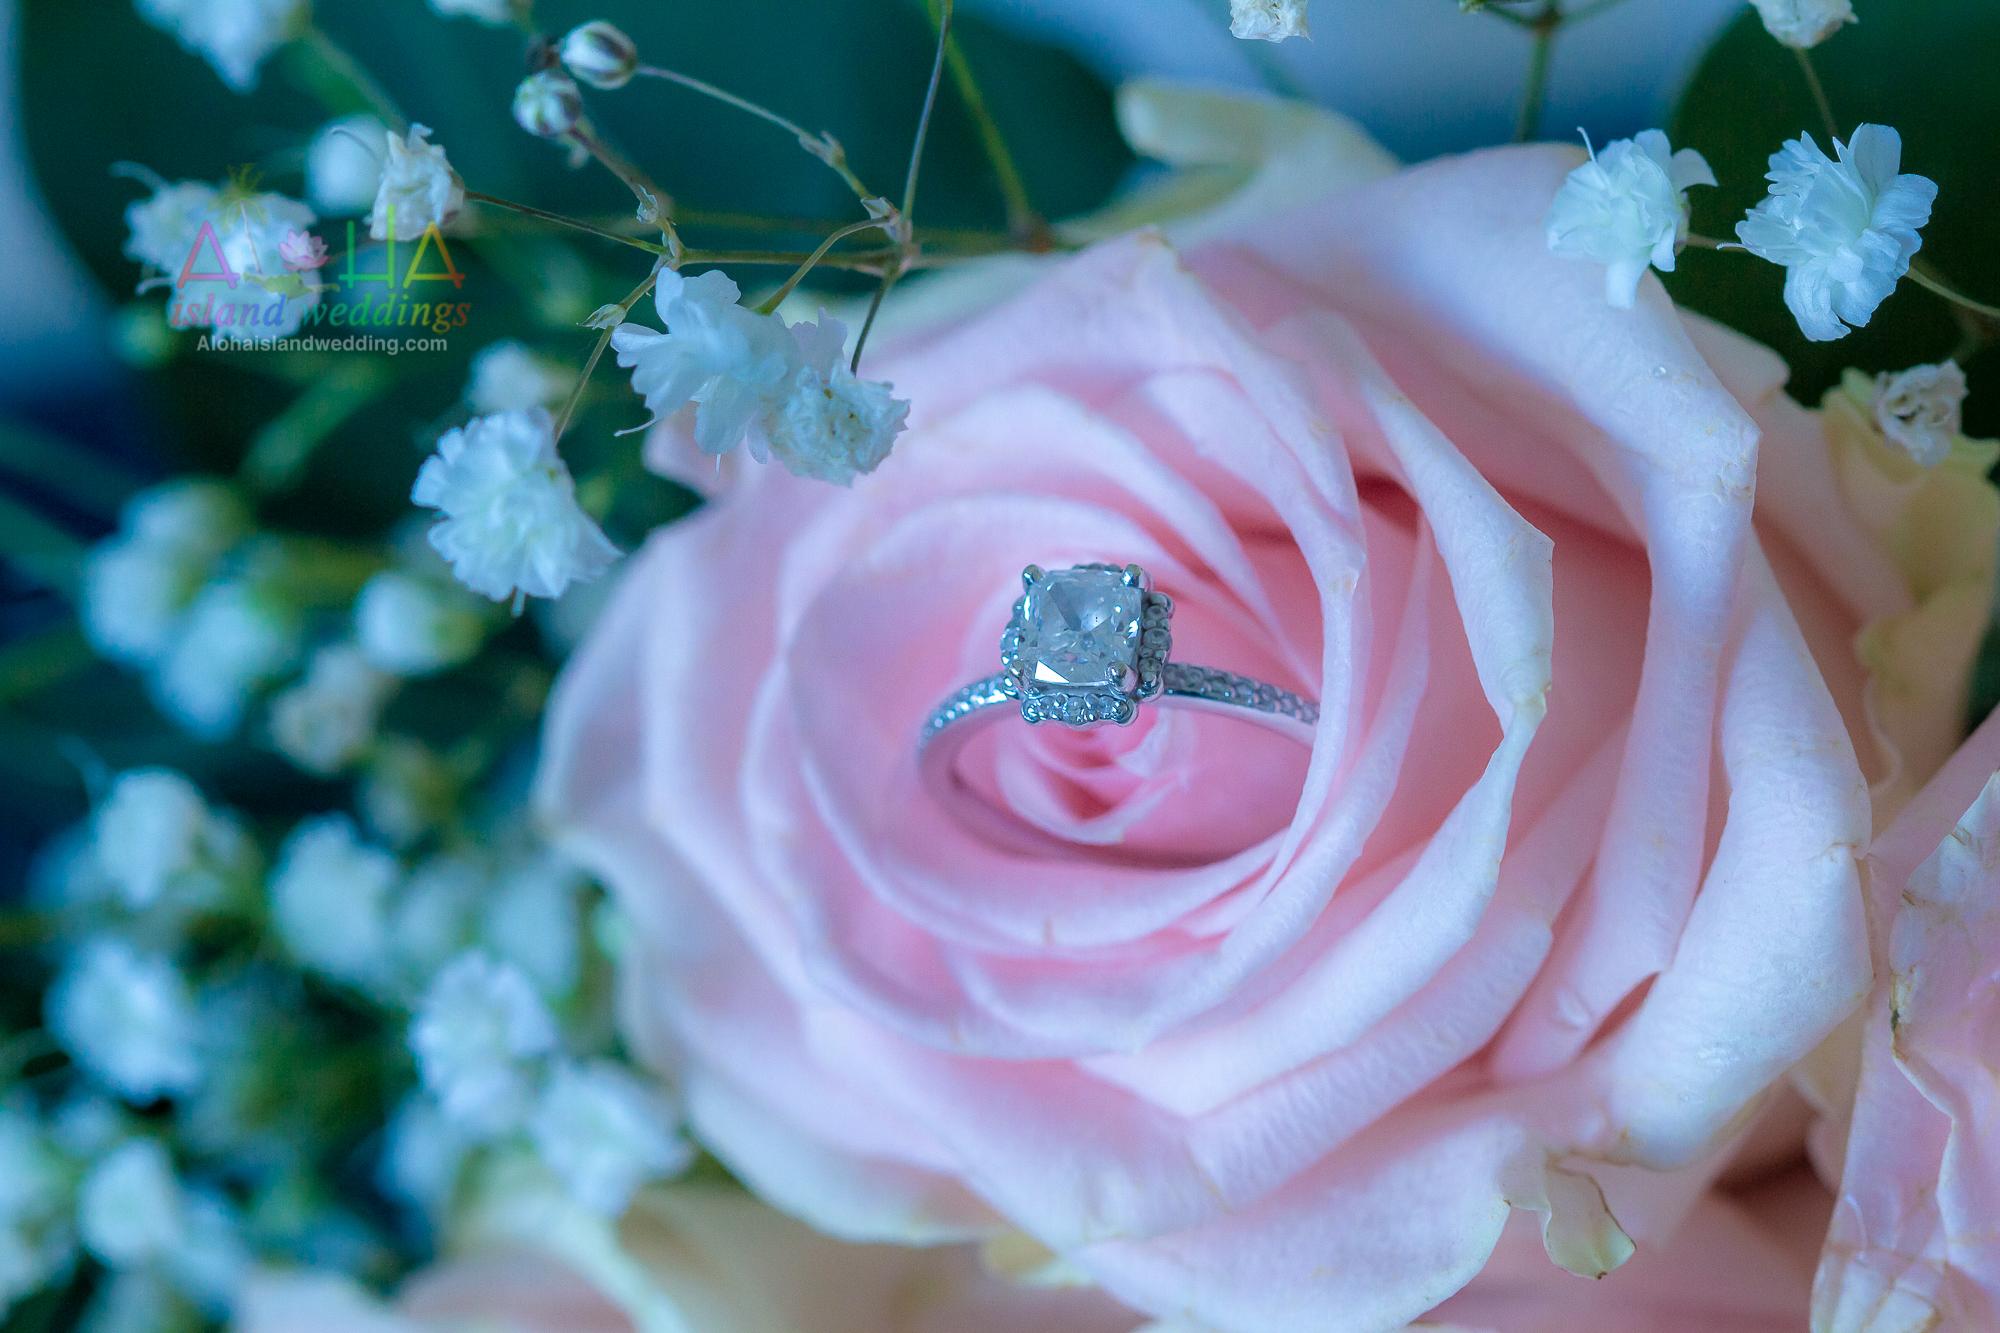 Hawaii weddings and events, Kualoa-344